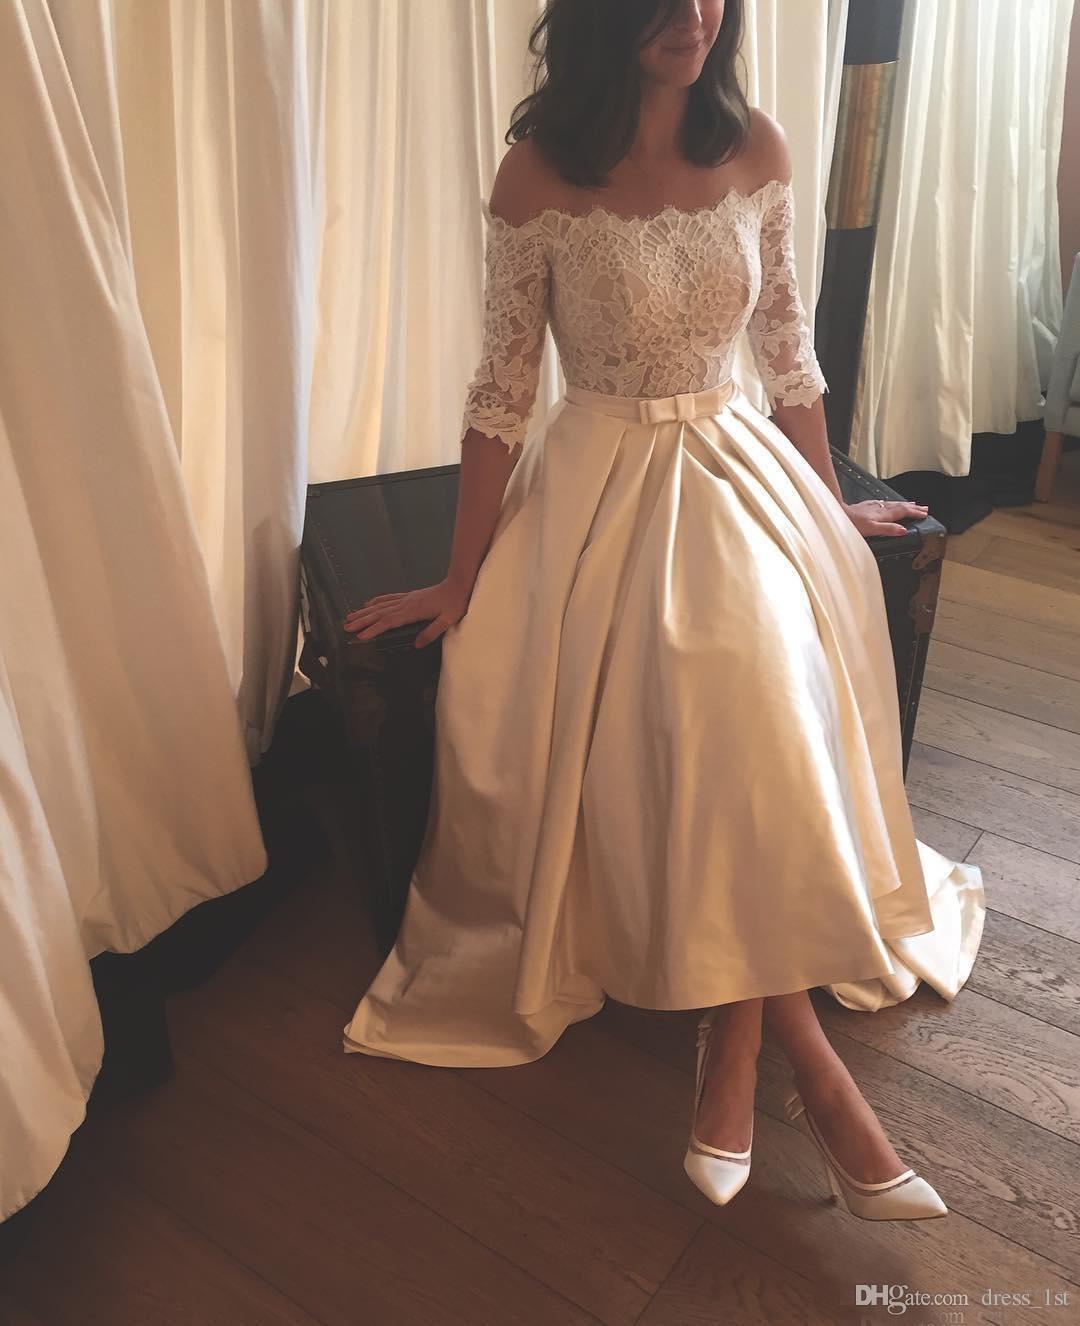 Graceful 2017 Off Shoulder Lace Half Sleeve High Low Wedding Dresses Cheap Saudi Arabic Bow Sash Long Bridal Gowns Cusotm Made China EN9073